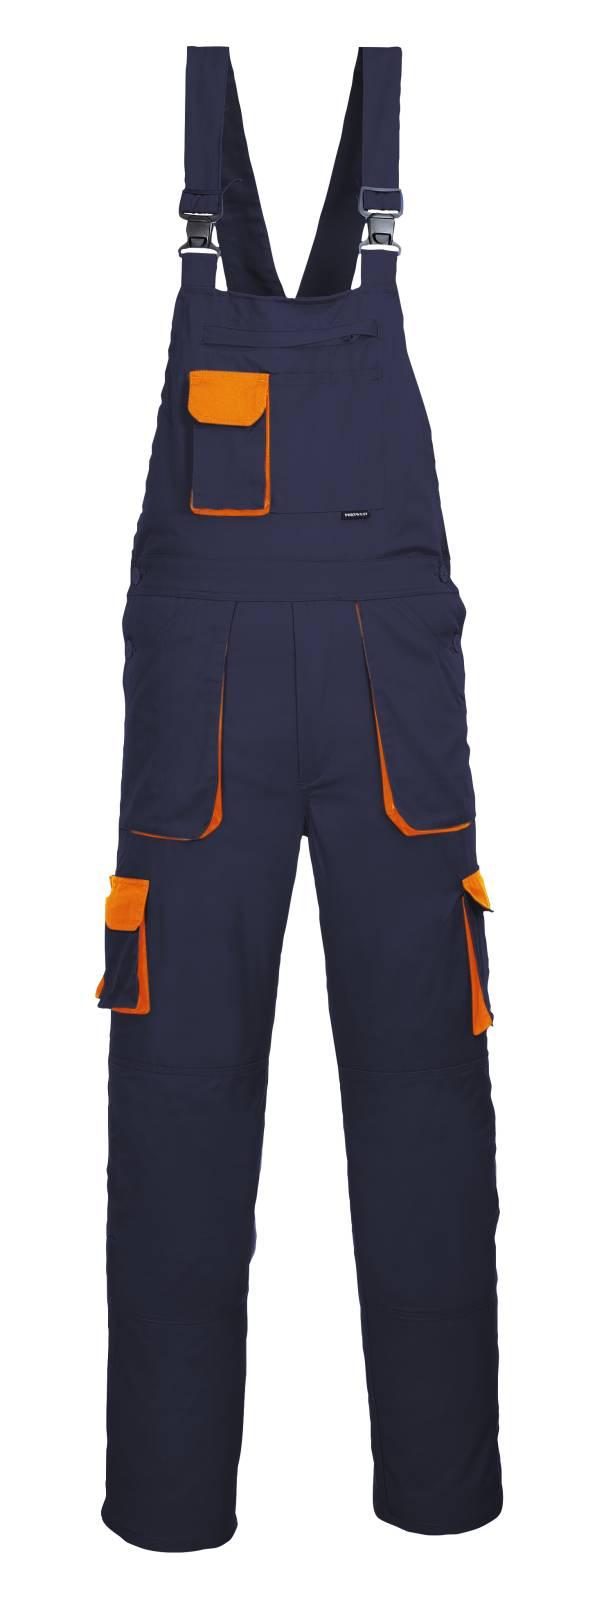 Portwest Amerikaanse overalls TX12 marineblauw-oranje(NO)